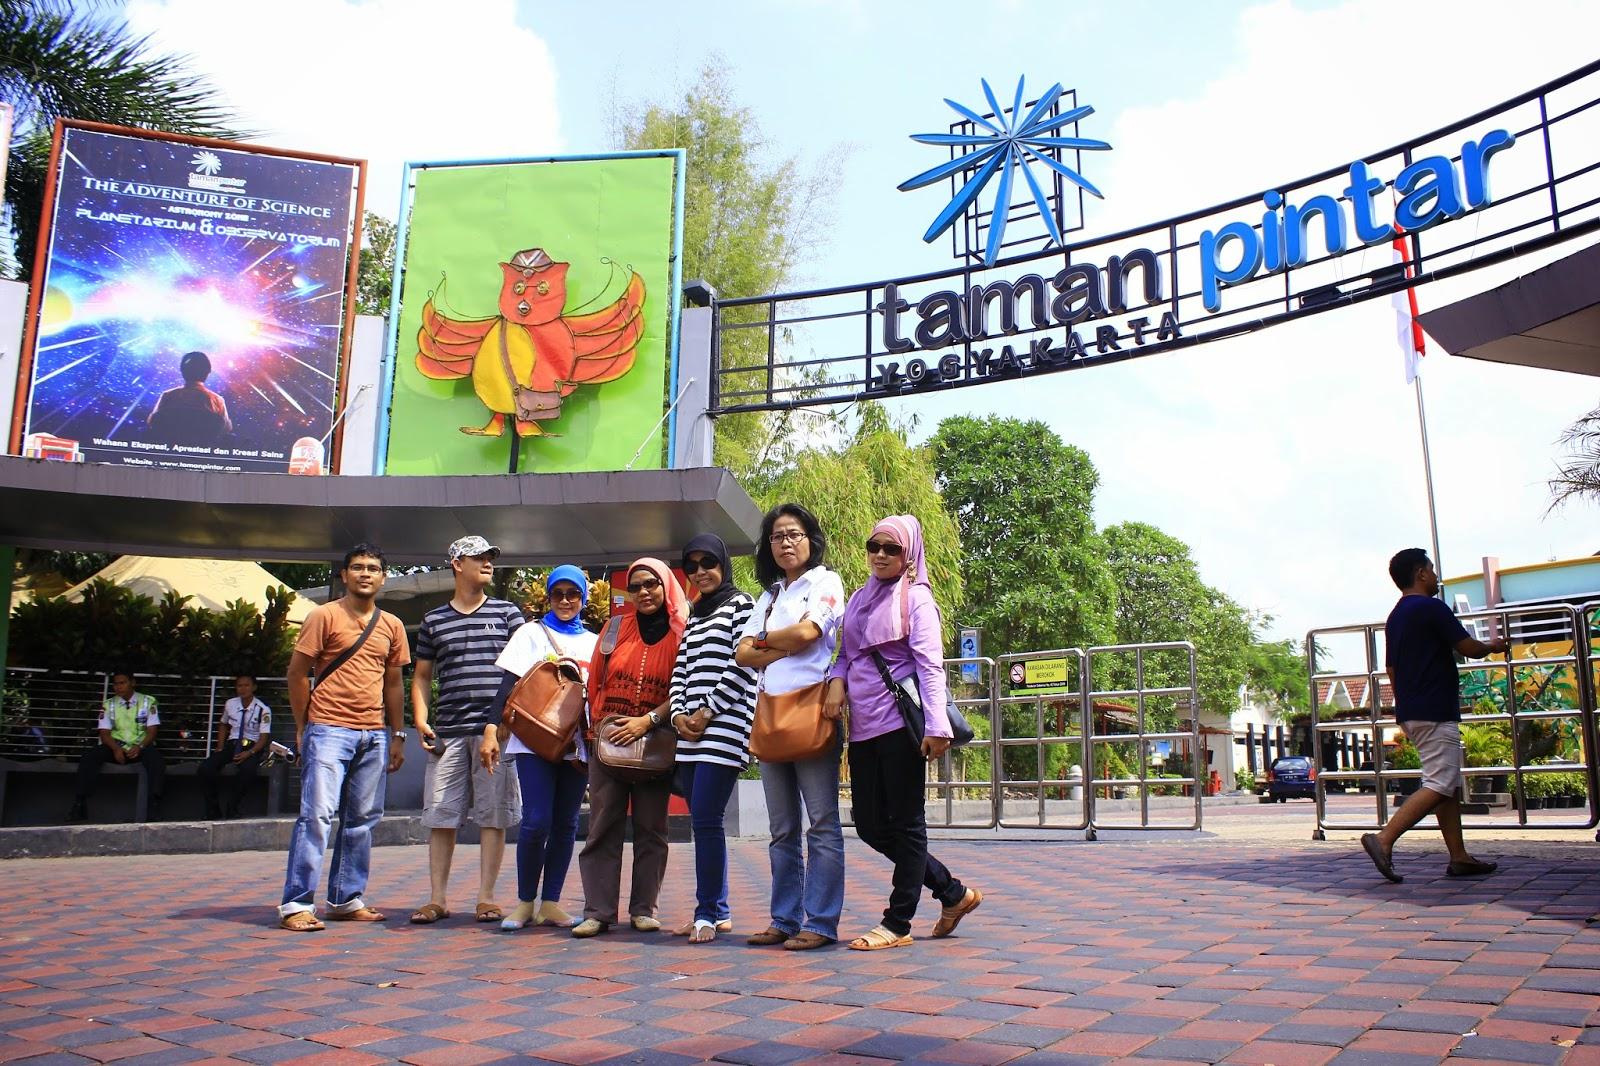 Taman Pintar Tempat Wisata Edukasi Yogyakarta Pulau Kota